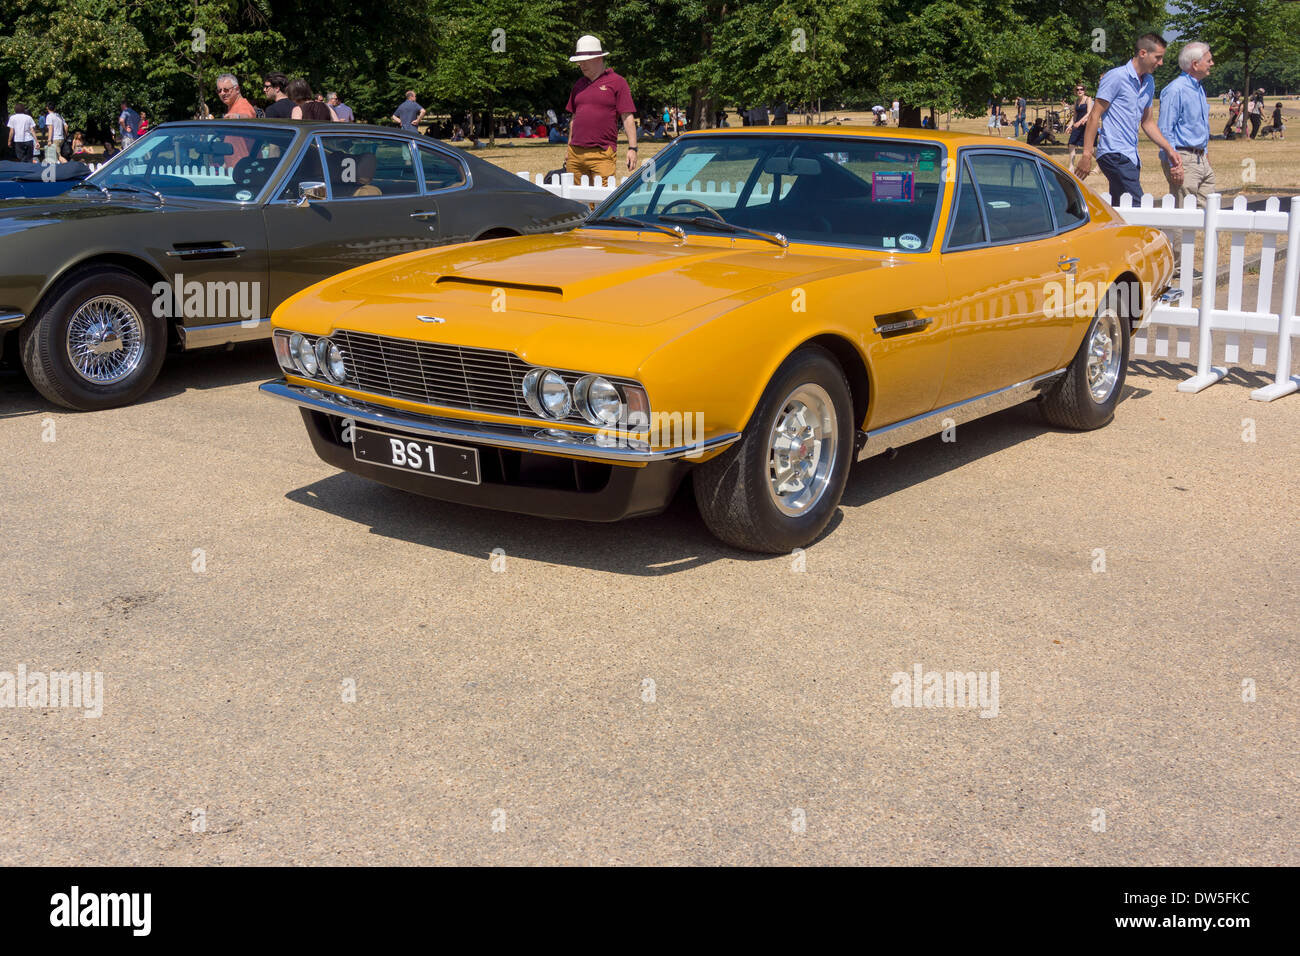 Aston Martin DBS (1967-1972), Aston Martin Timeline, Centenary ...